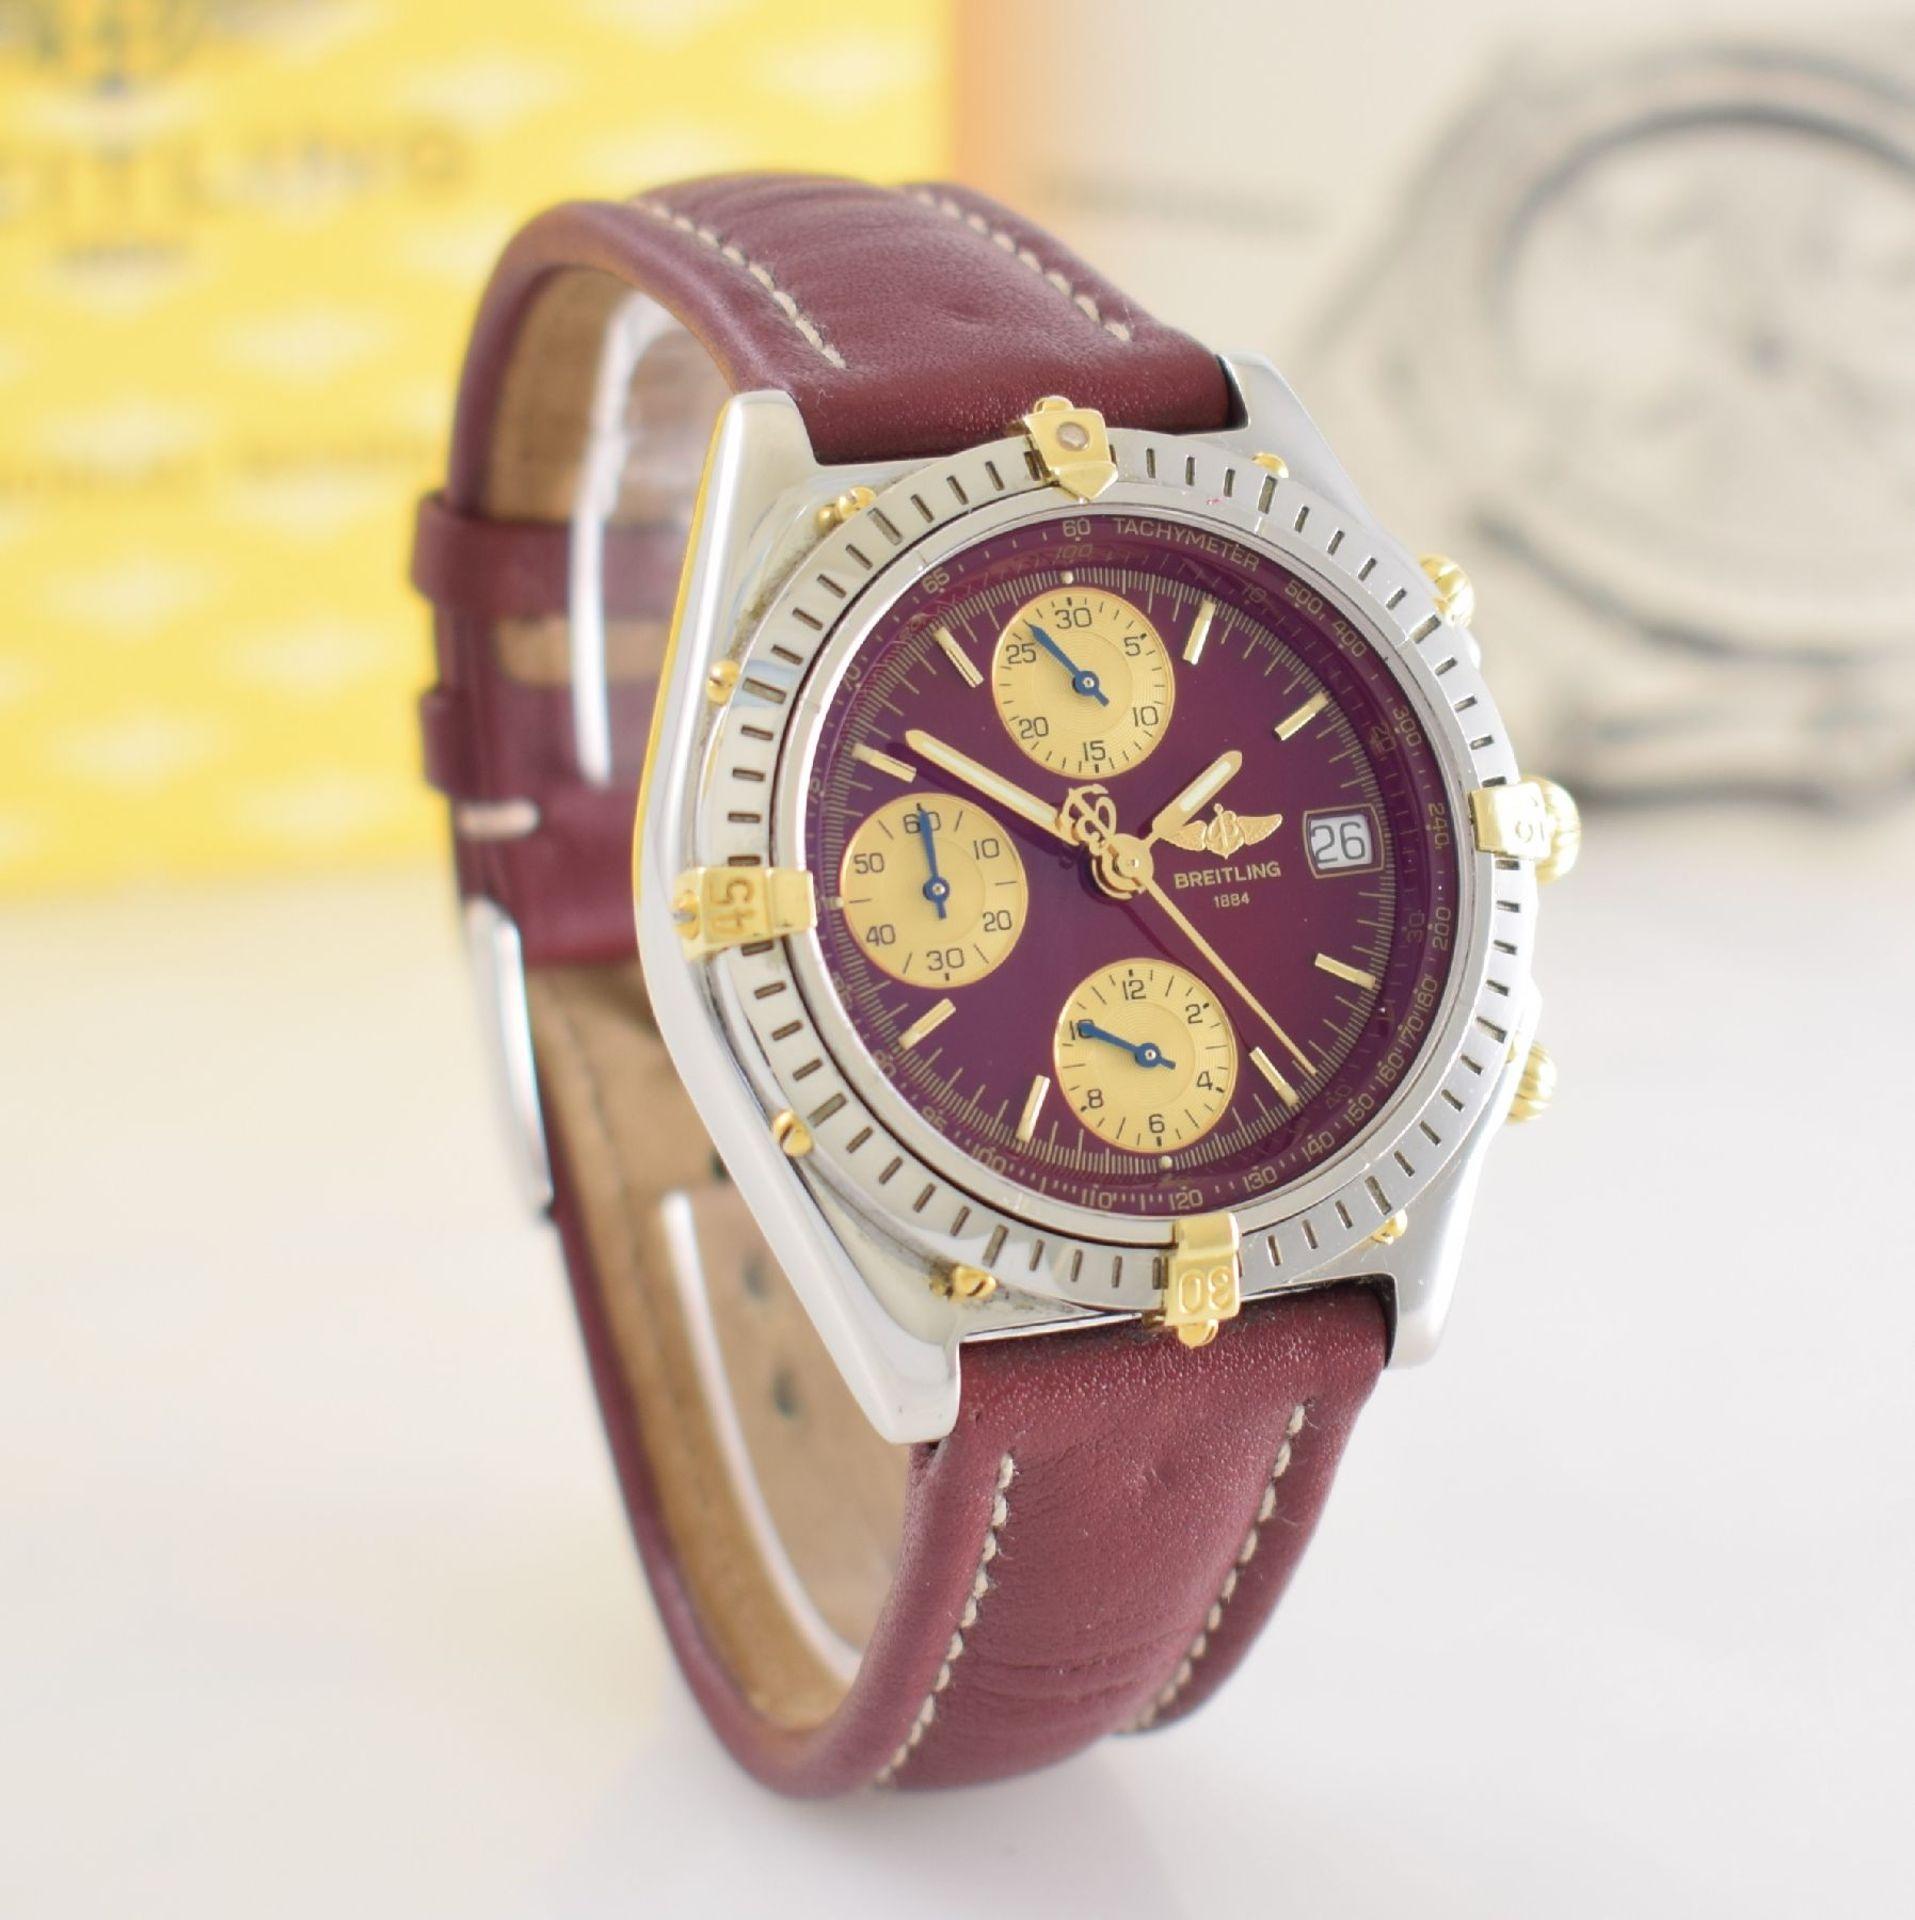 BREITLING Chronomat Herrenarmbanduhr mit Chronograph, Schweiz verk. lt. beil orig. Garantiekarte - Bild 7 aus 8